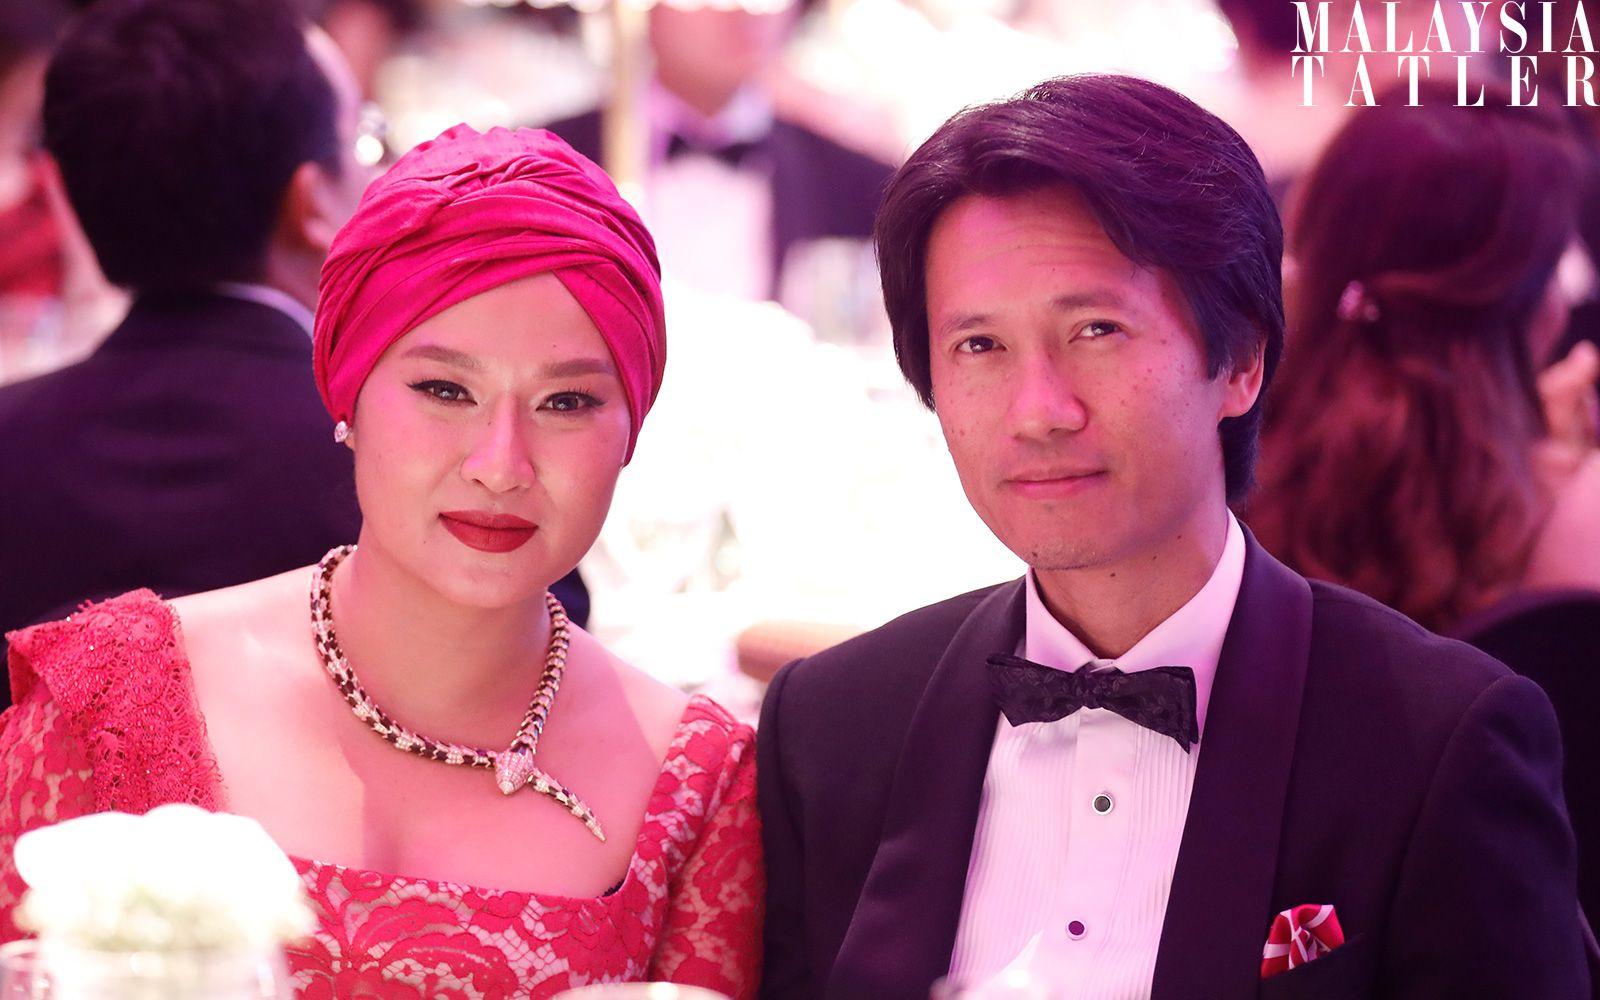 Dato' Sri Rozita Ramelan and Datuk Omar Mustapha